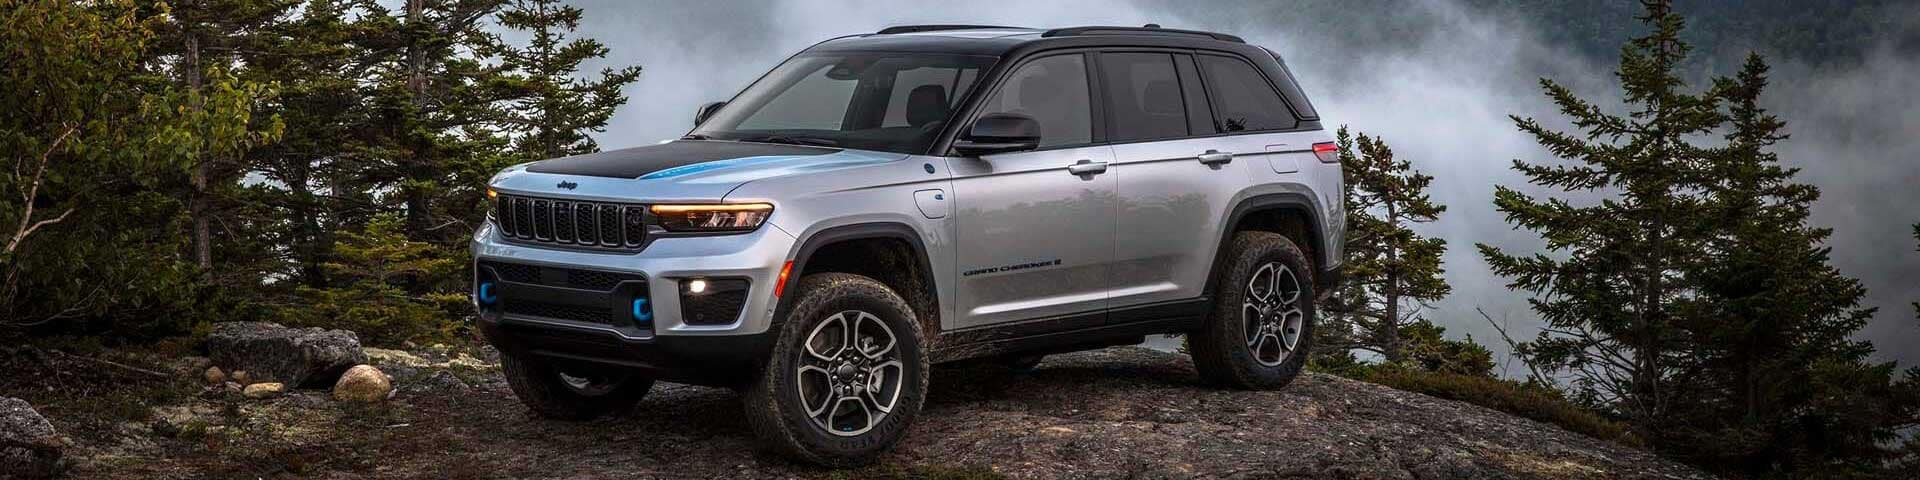 2022 Jeep Grand Cherokee in Buena Park, CA